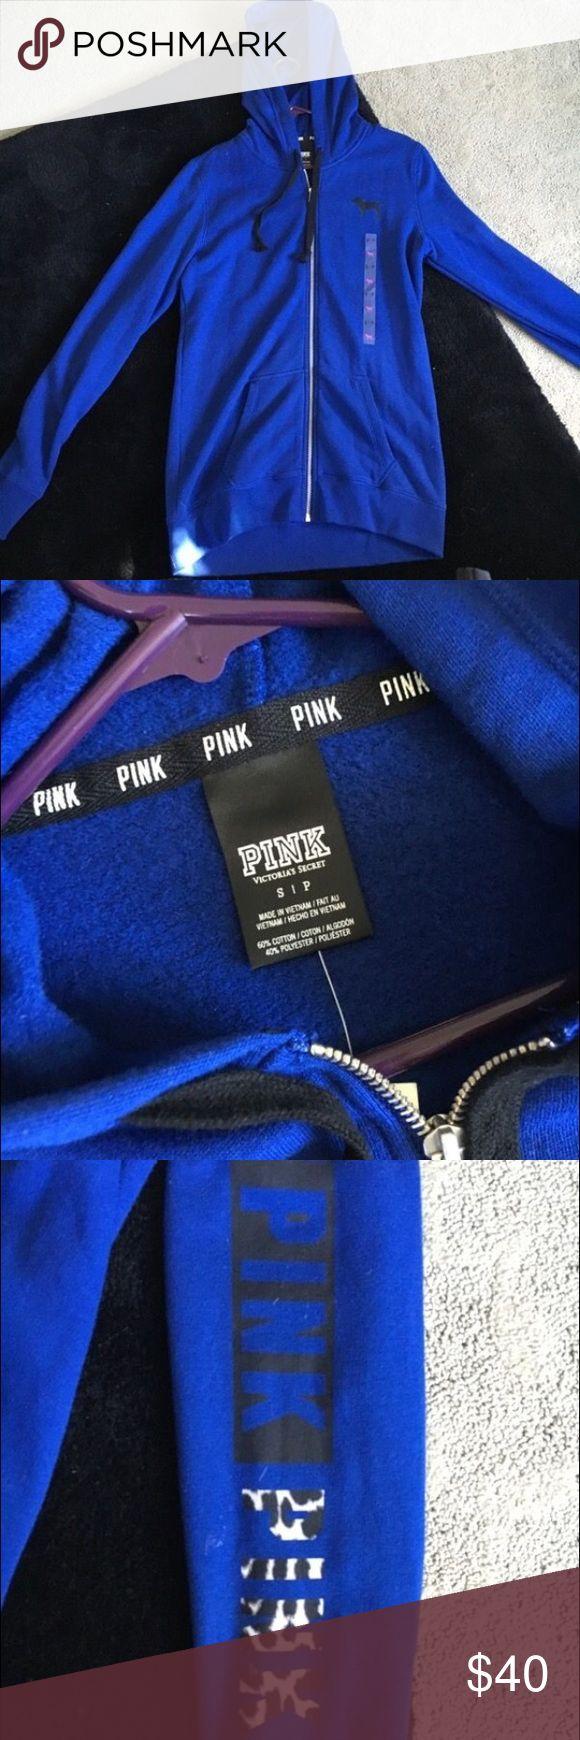 Victoria's Secret boyfriend jacket. Brand new Victoria's Secret boyfriend jacket. Brand new with tags. Size small but fits medium. I wear a small or medium but it's too big. Needs to go now Victoria's Secret Jackets & Coats